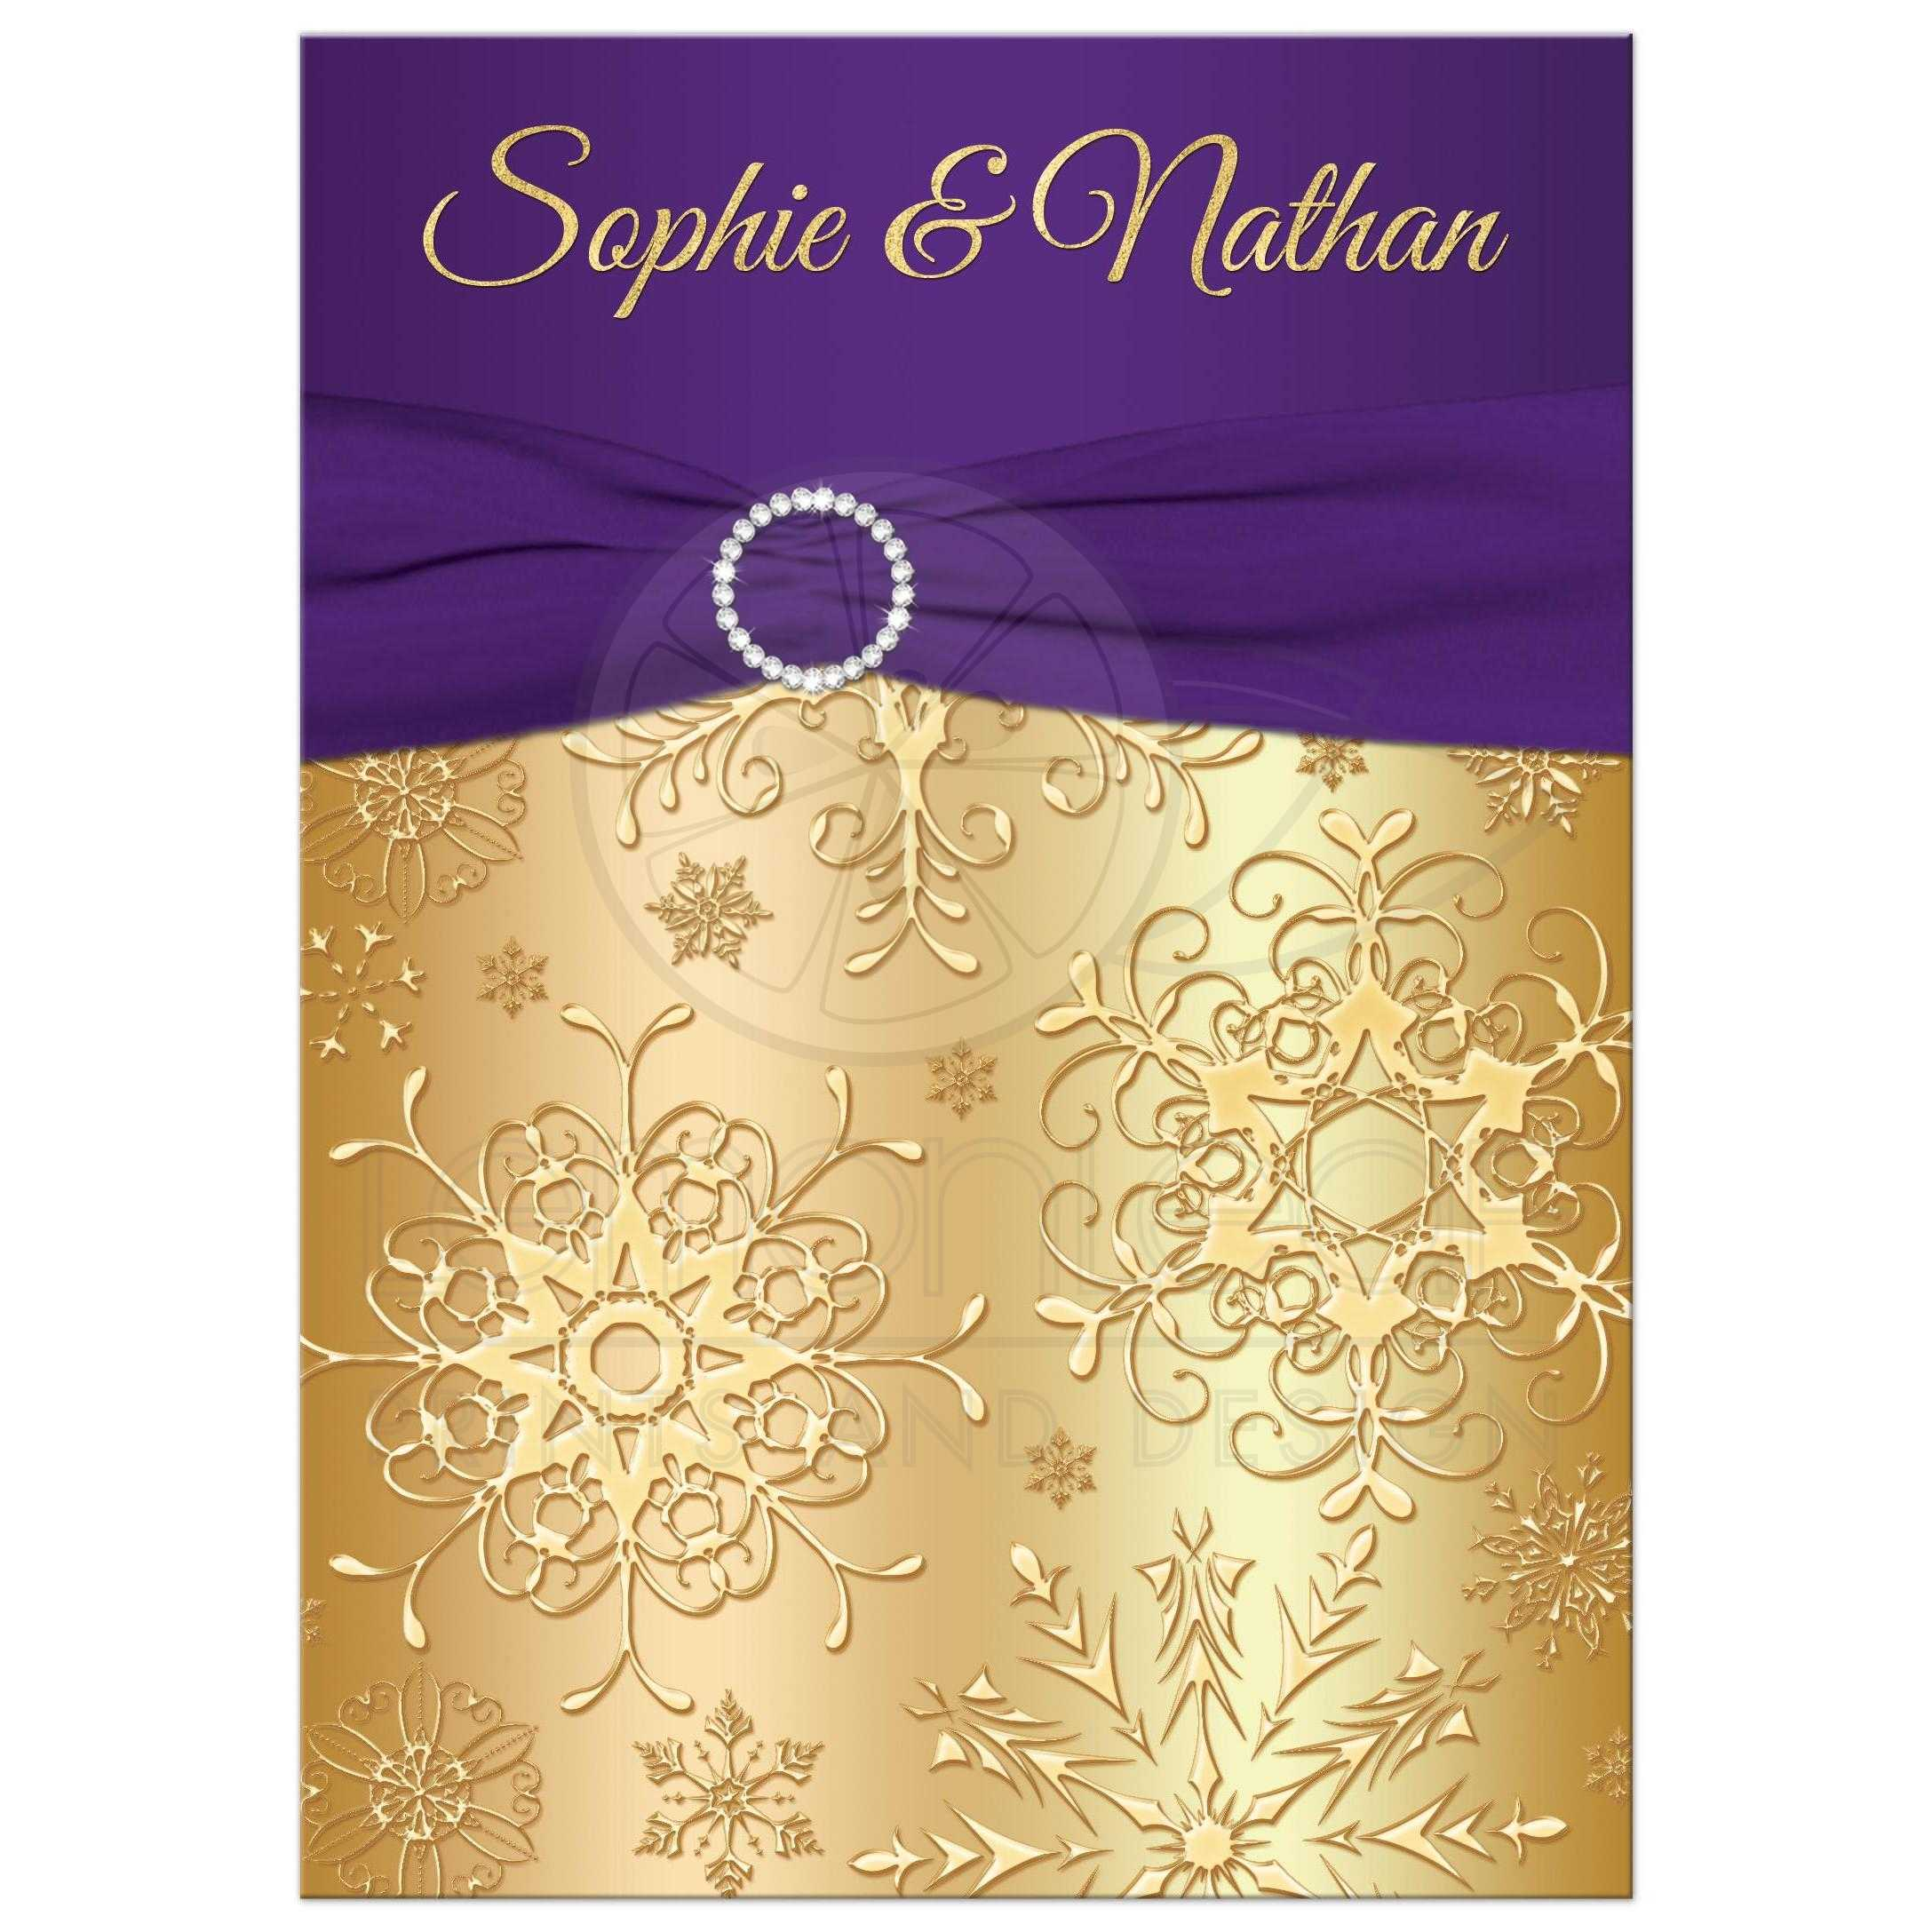 elegant purple and gold wedding invitations purple and gold wedding Winter Wedding Invitation Purple Gold Snowflakes Printed